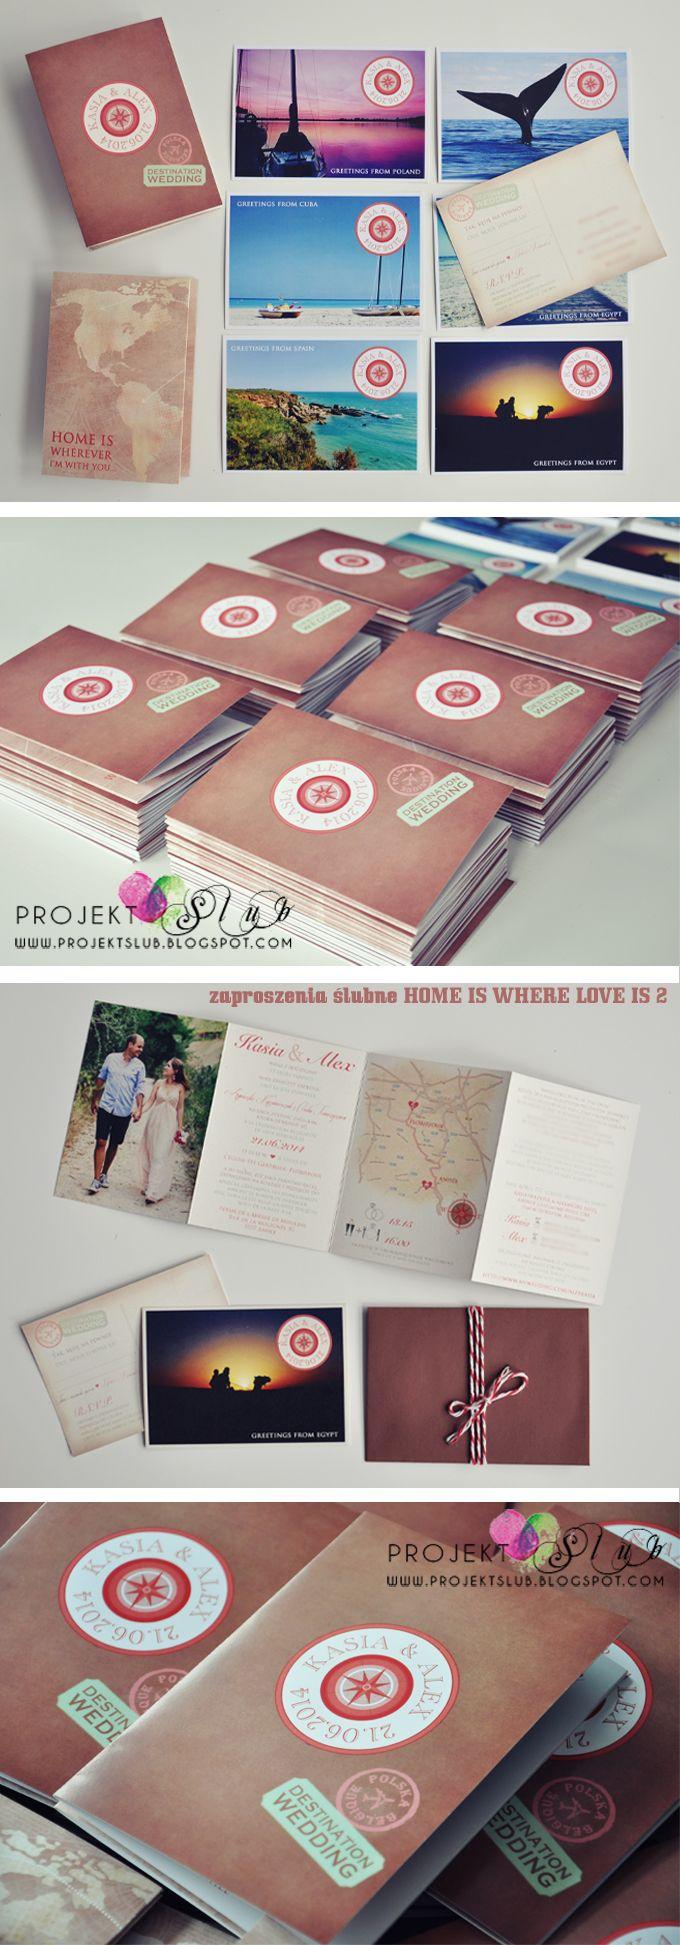 4 6 Vintage Zaproszenia Od Projekt A Lub Bridelle Wedding